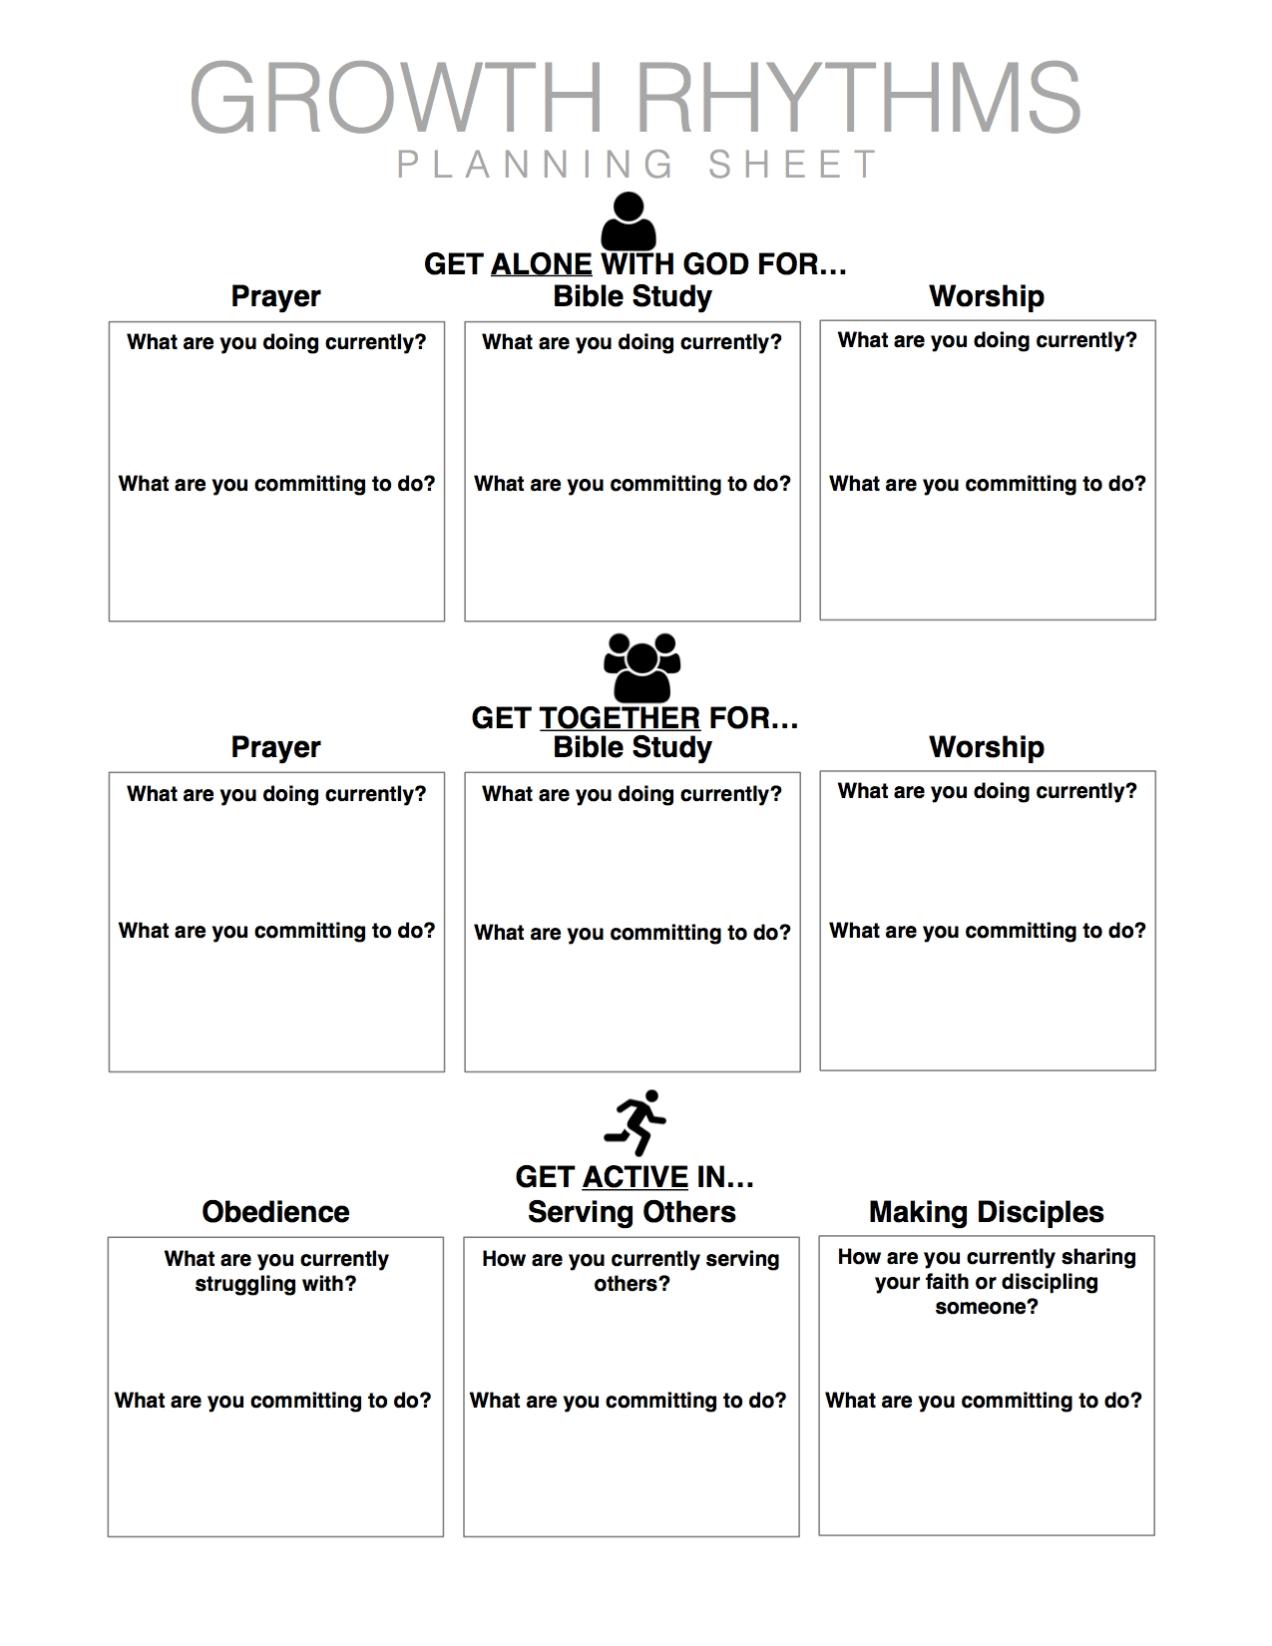 Growth Rhythms Conversation Guide & Planning